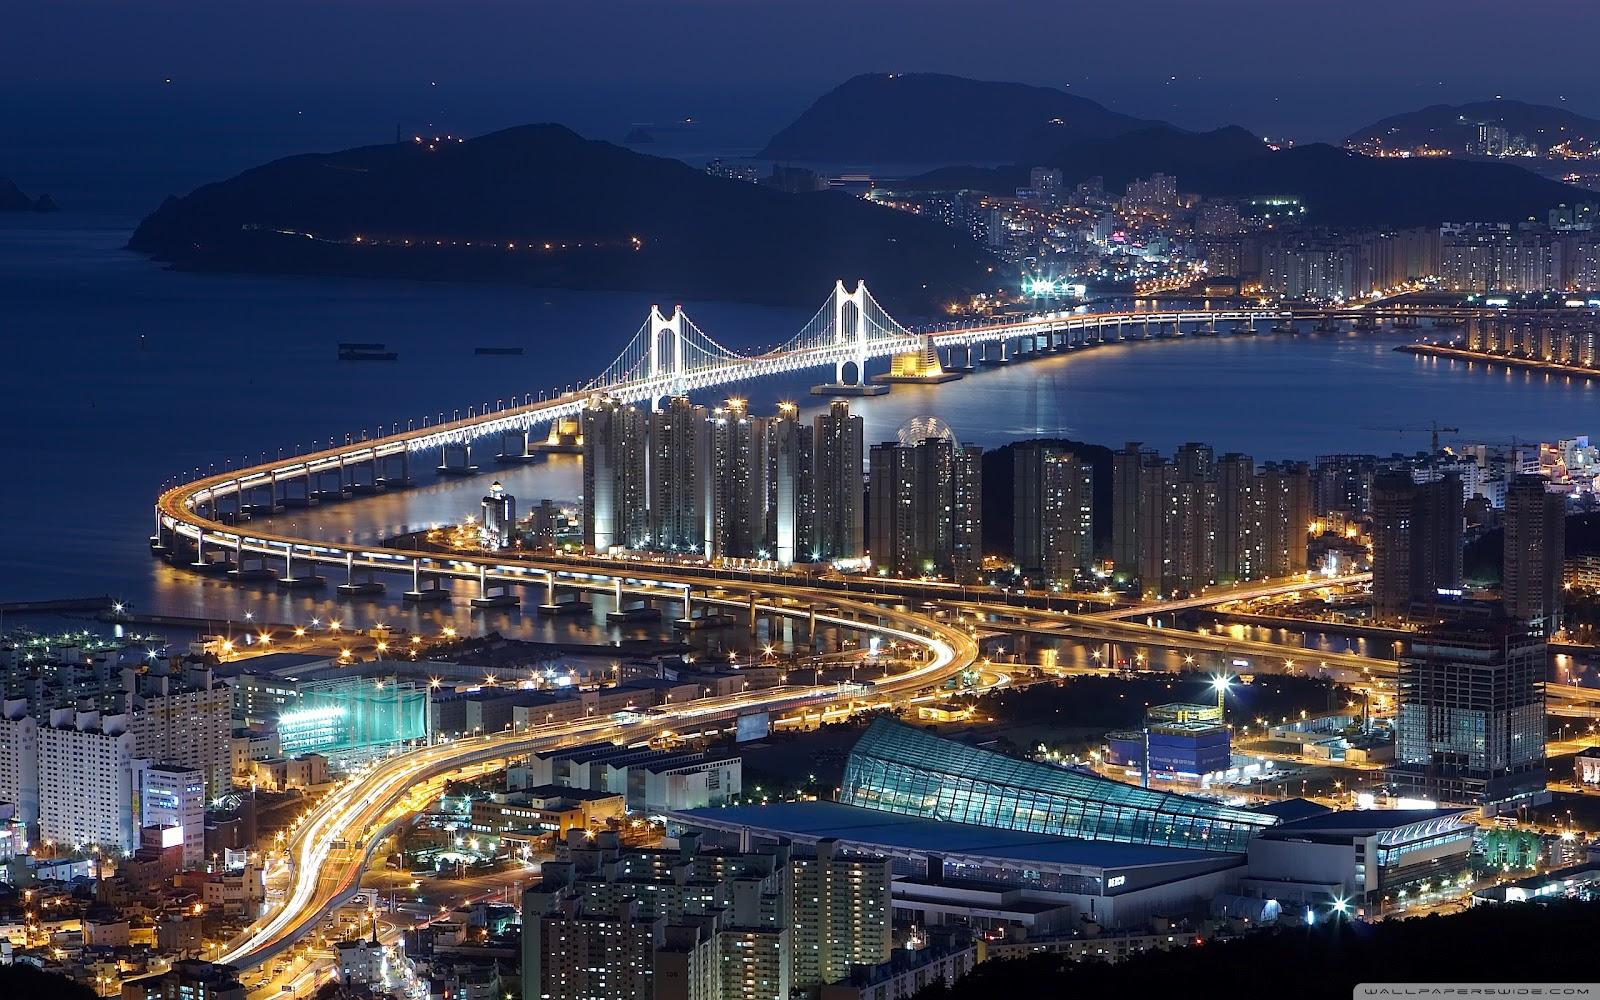 http://2.bp.blogspot.com/-Yw_dXZNmIR0/T4islz5FBcI/AAAAAAAABU4/14dQuOxTFUU/s1600/gwangan_bridge_busan_south_korea-wallpaper-2560x1600.jpg